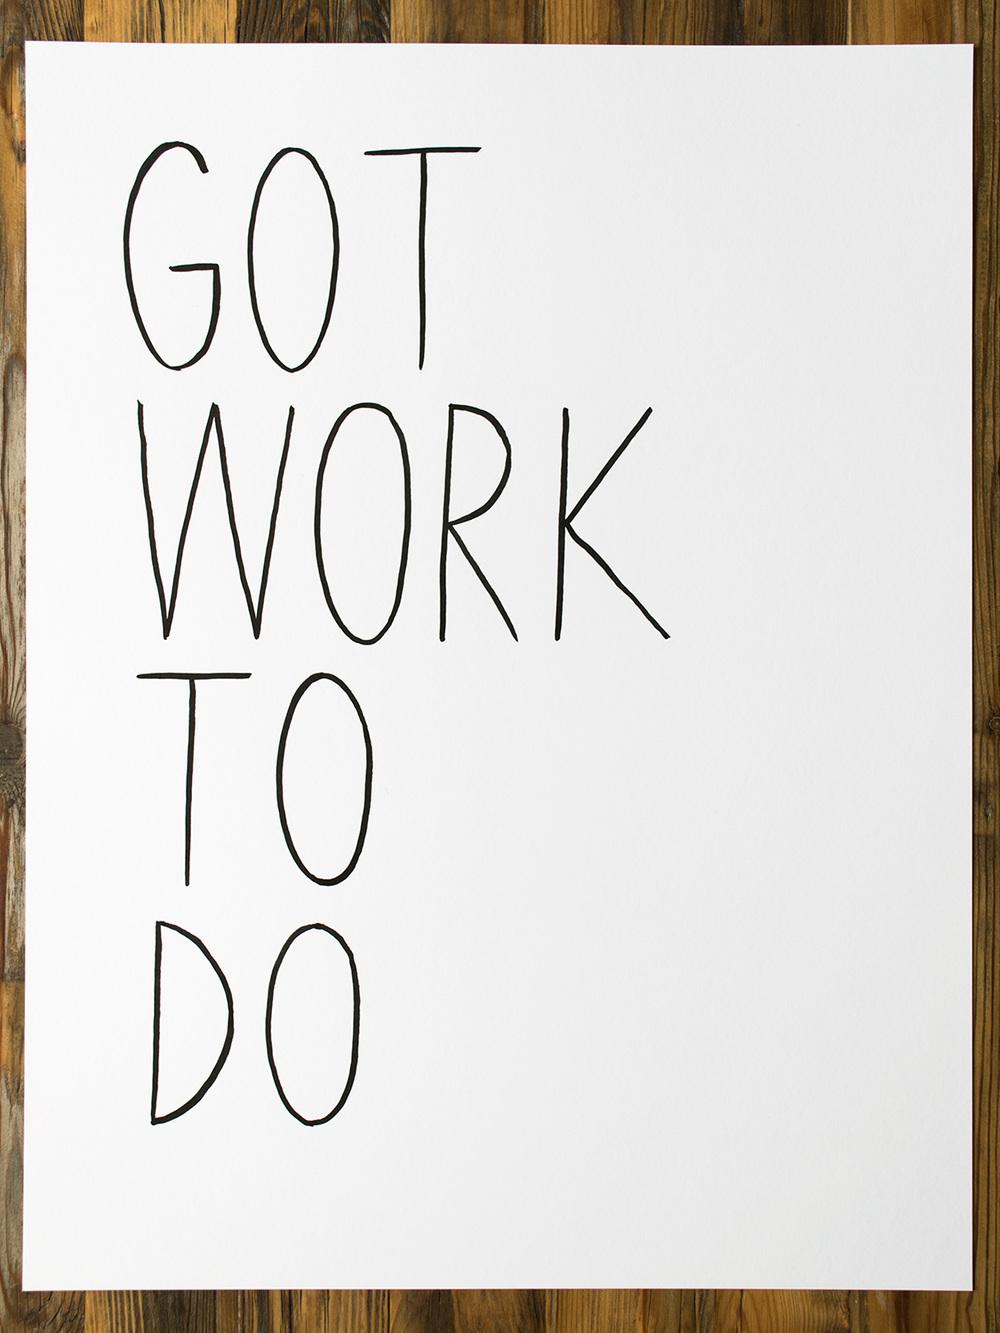 got_work_to_do-1500x1125.jpg